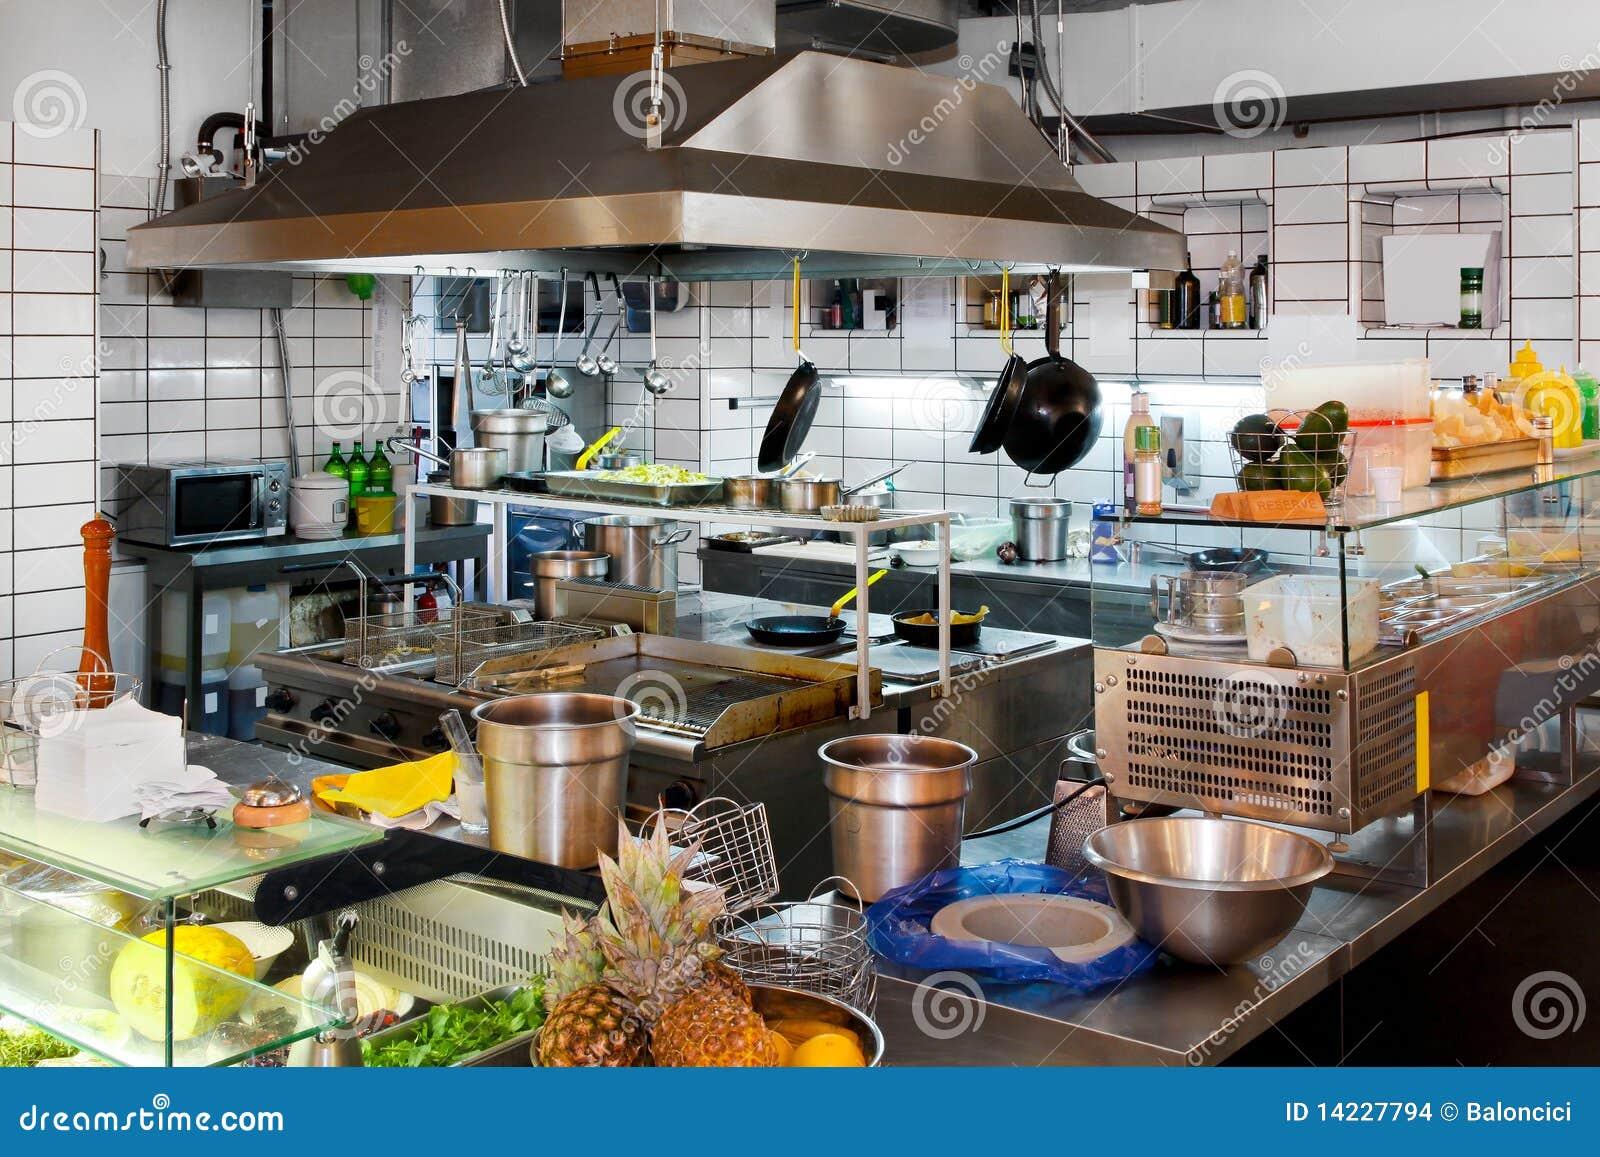 Professional Kitchen Stock Image